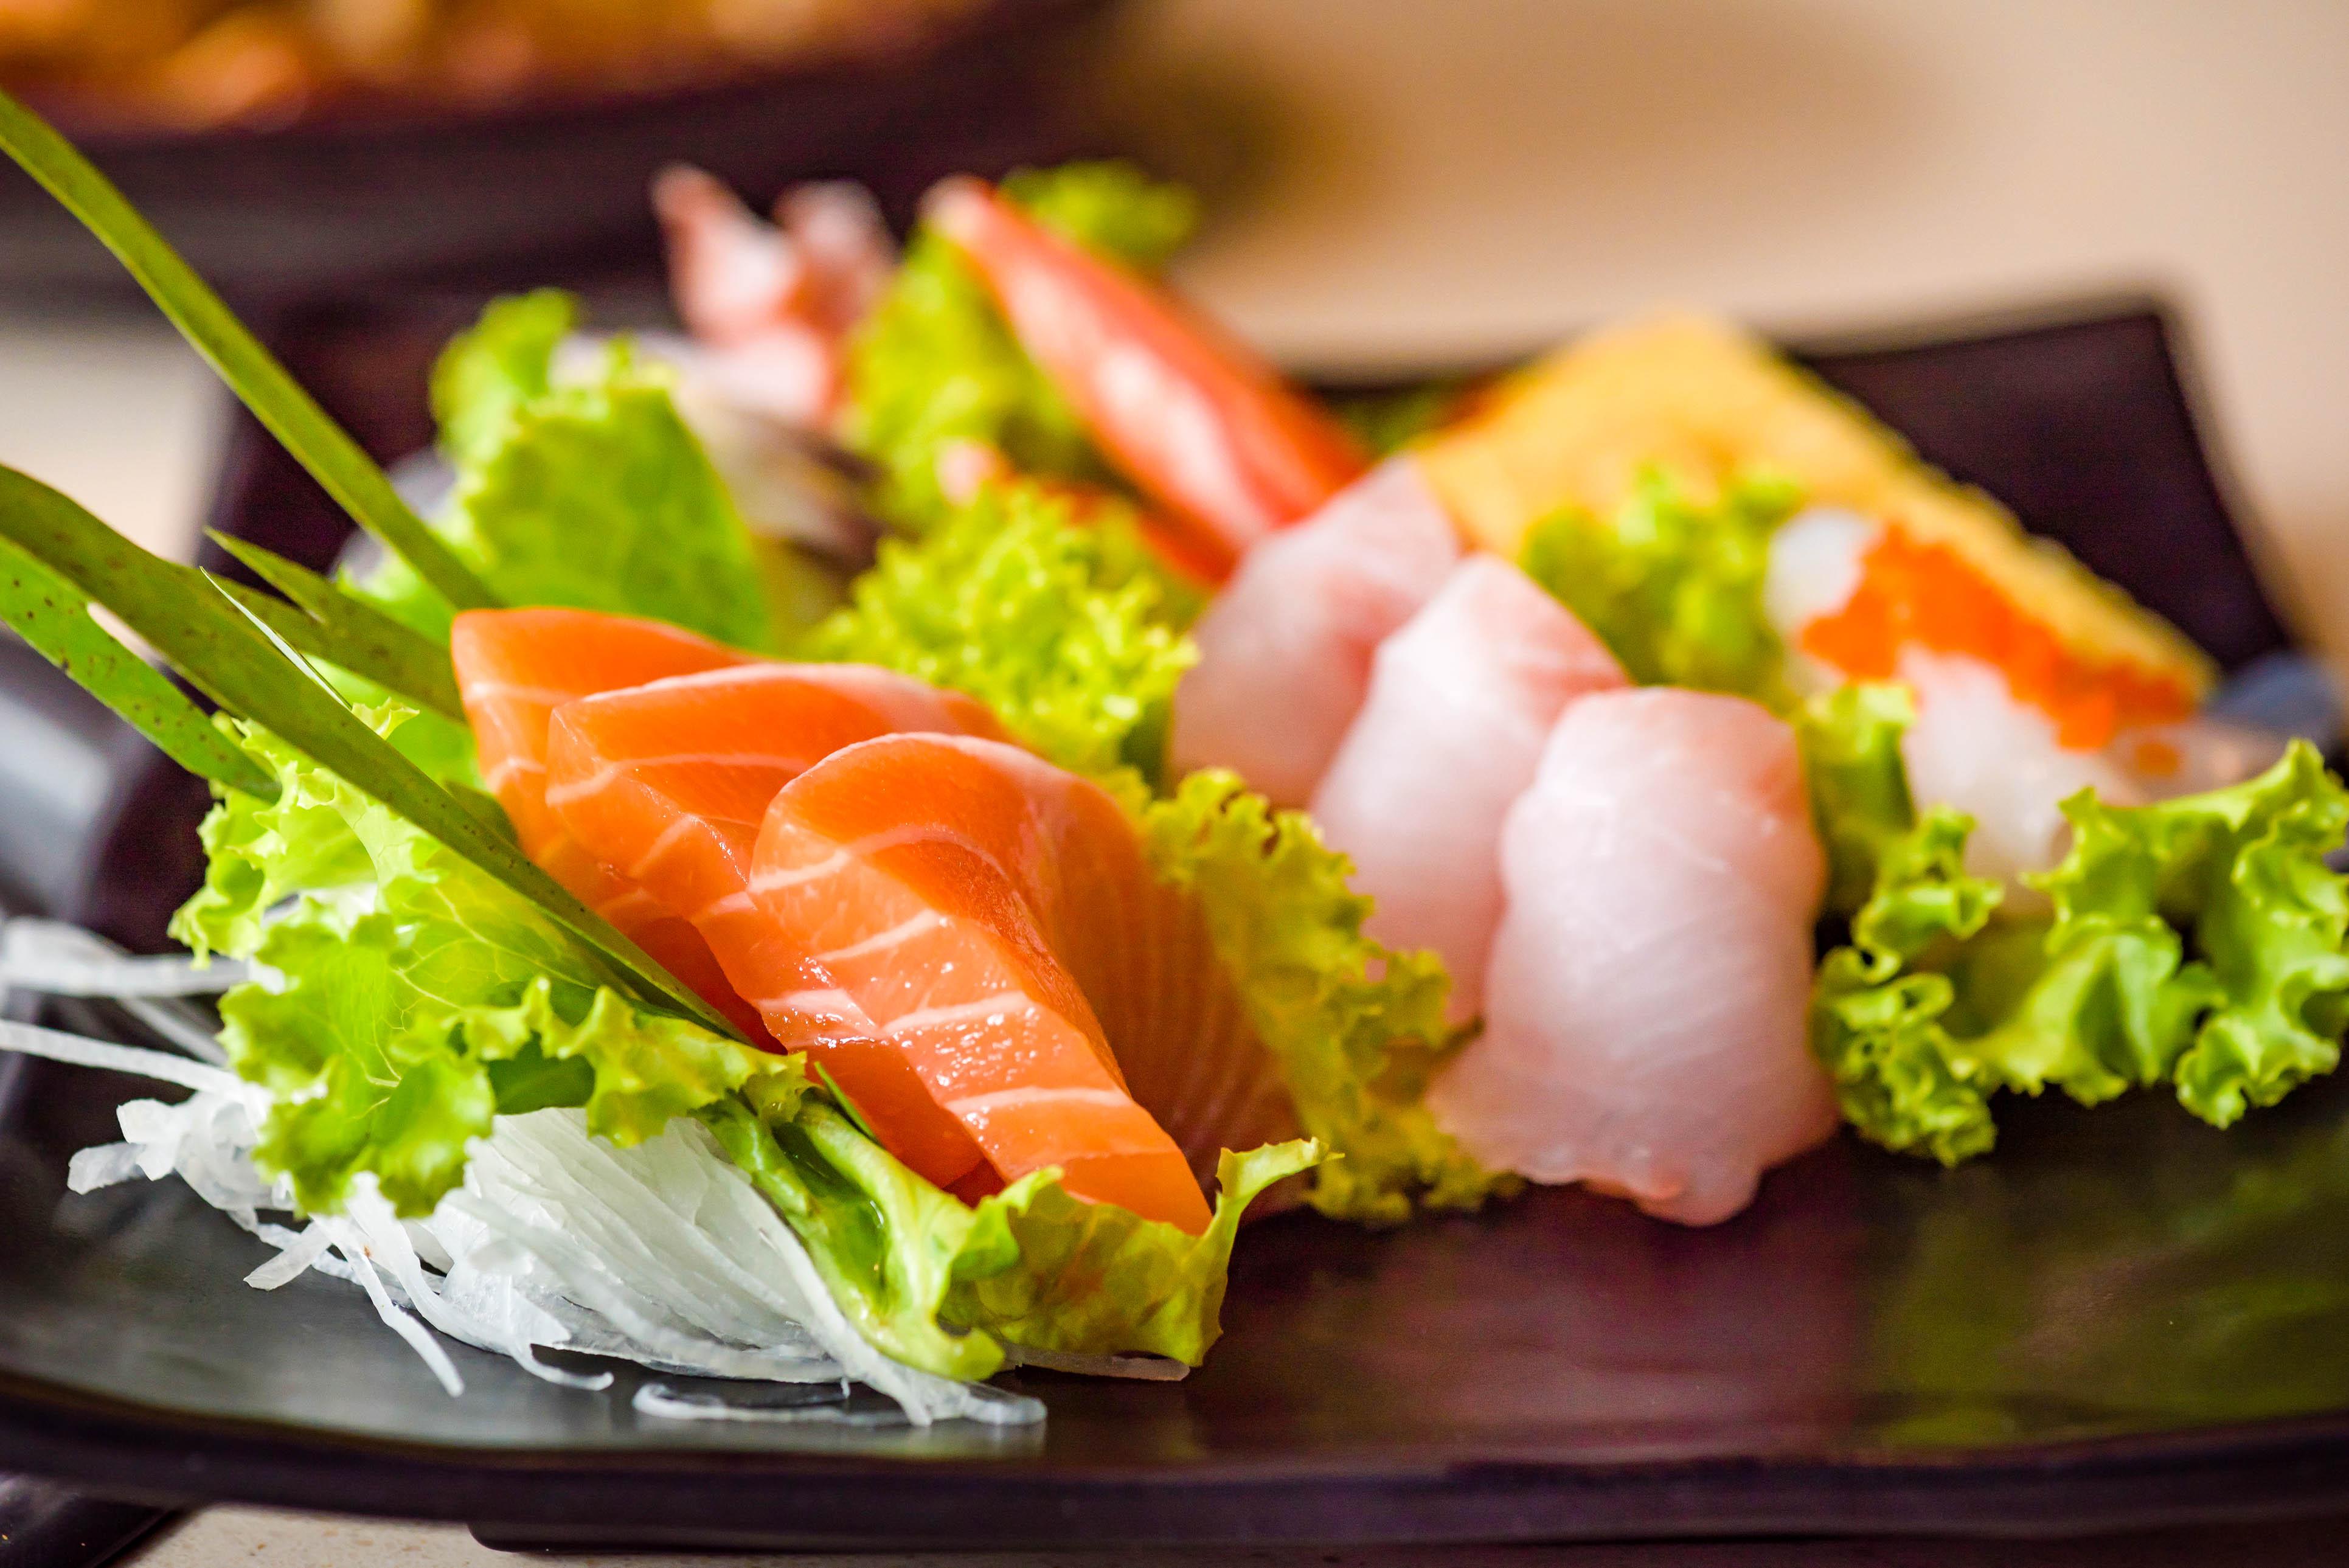 Charmant Stadt Sushi Küche Ideen - Küche Set Ideen - deriherusweets.info